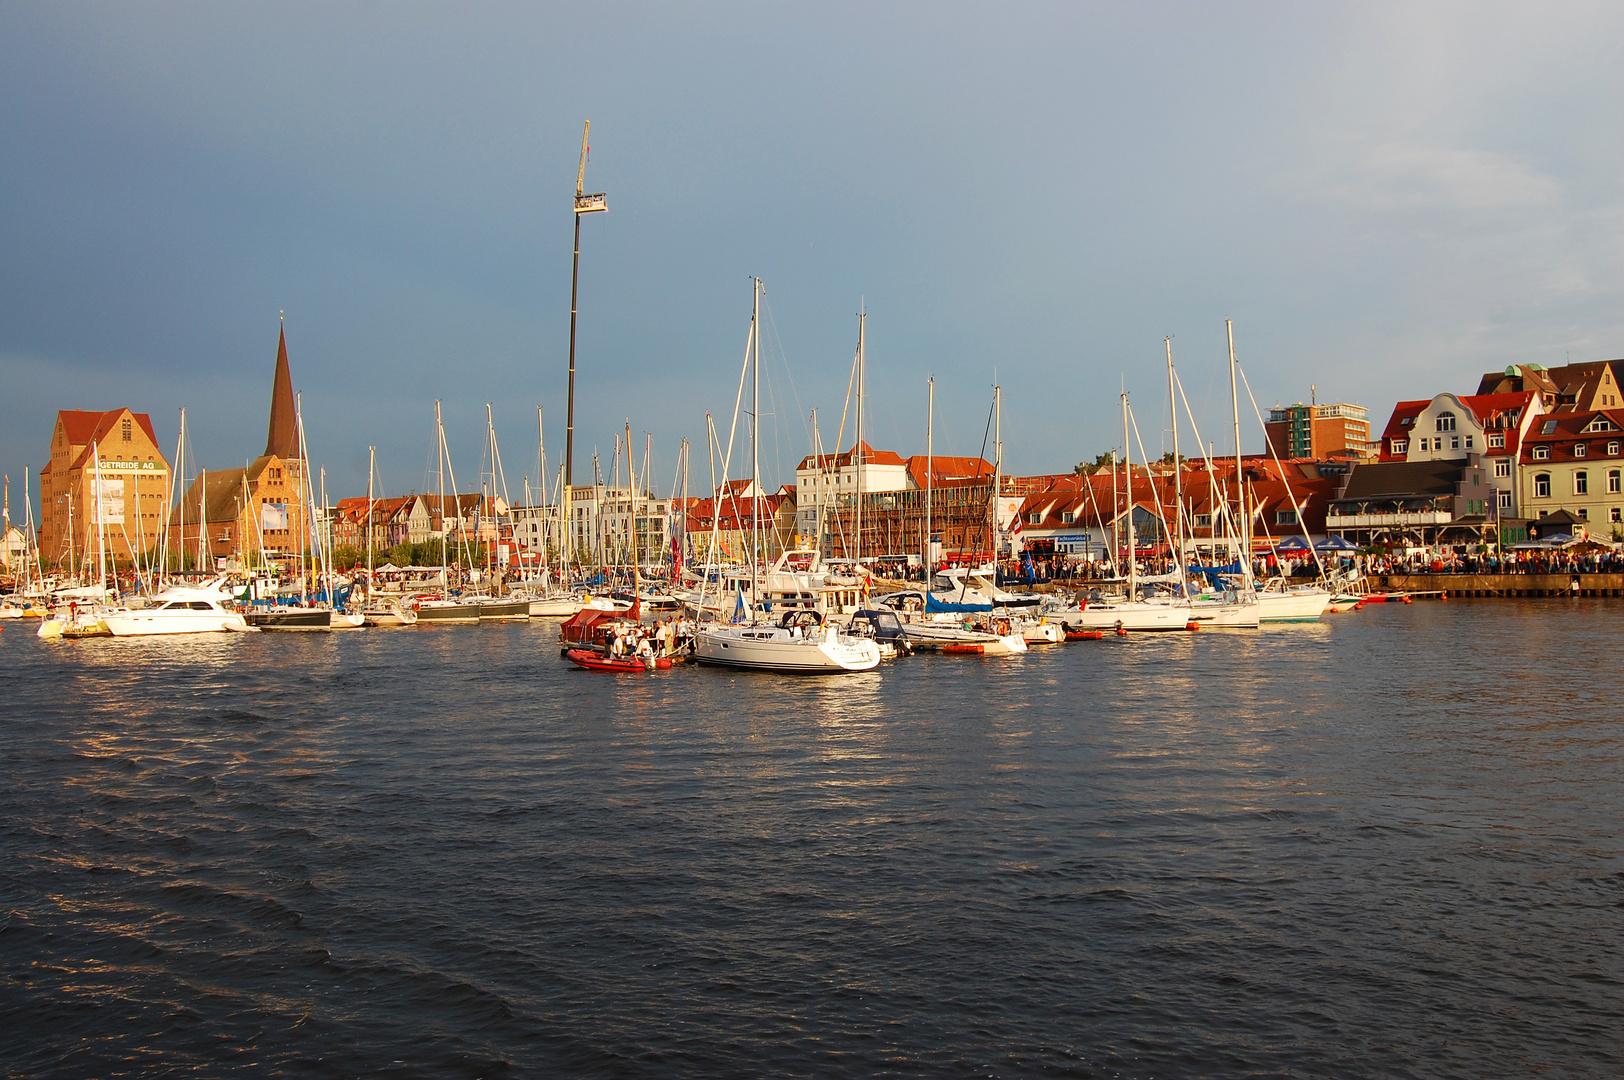 20. Rostocker Hanse Sail 2